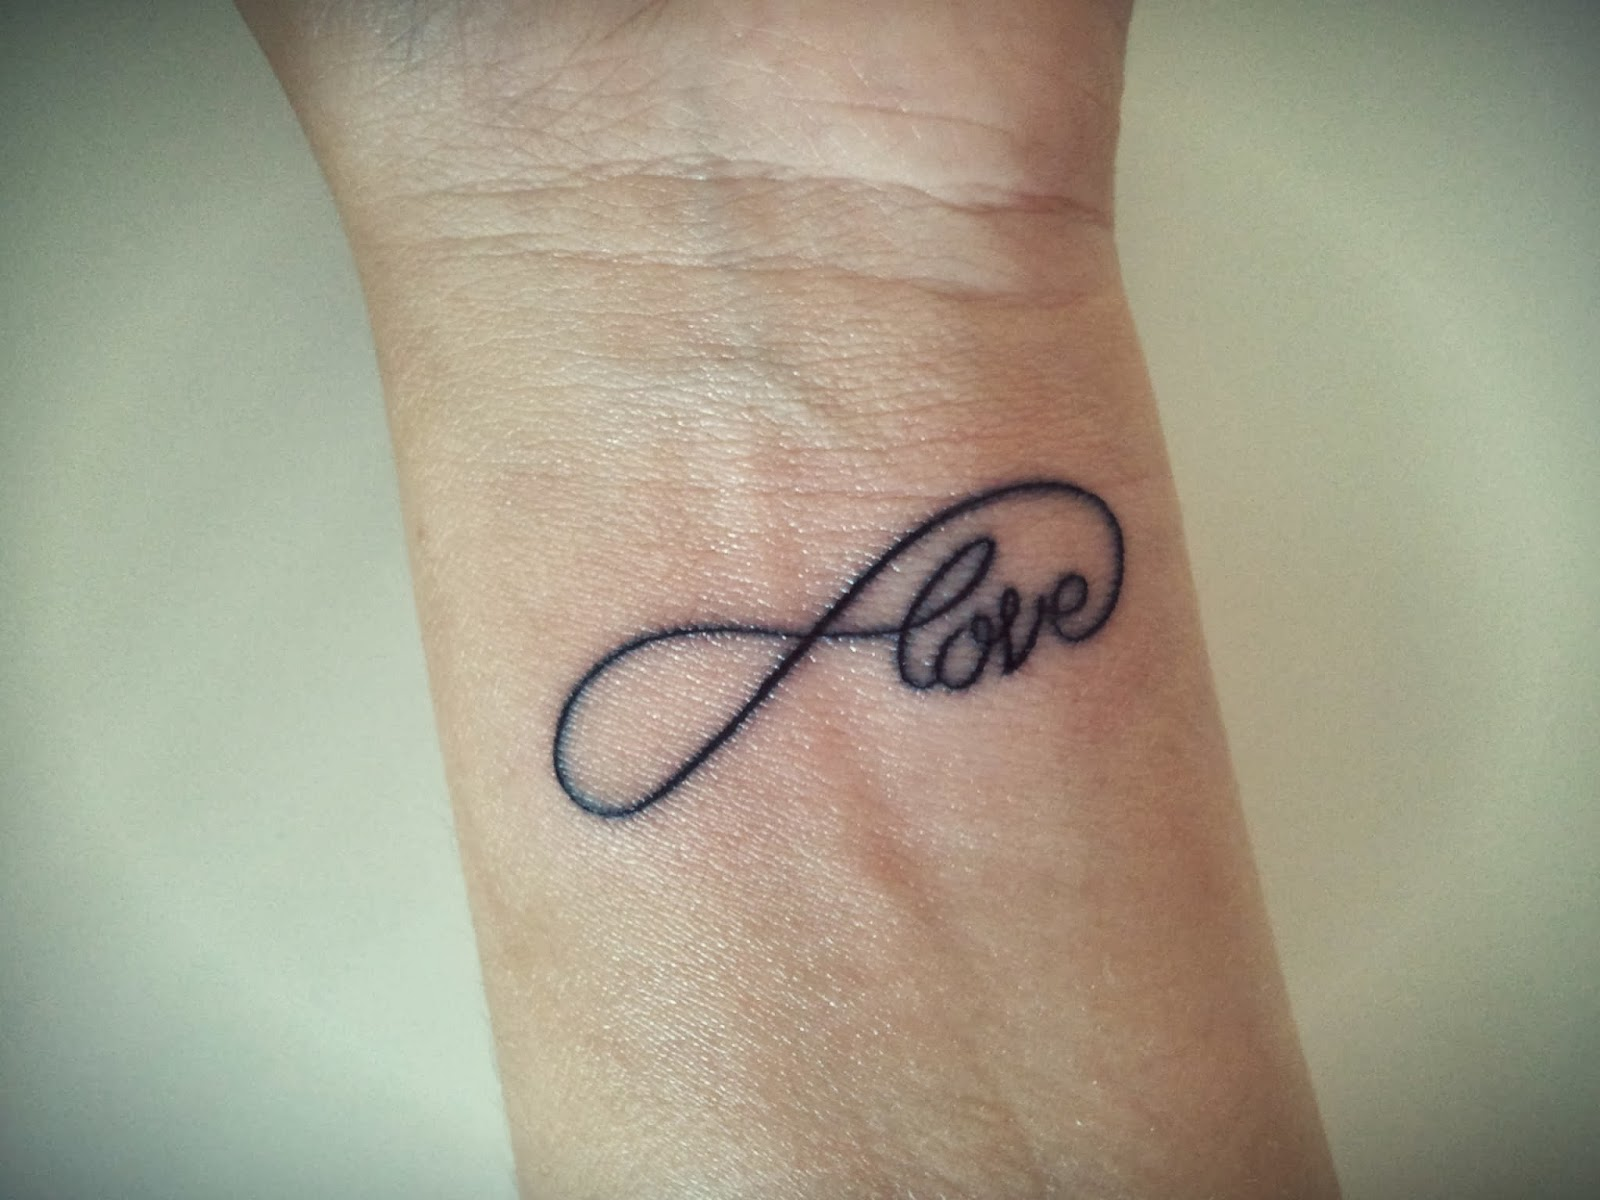 Tatuaje Con El S Mbolo Infinito Y La Palabra Infinity Infinito